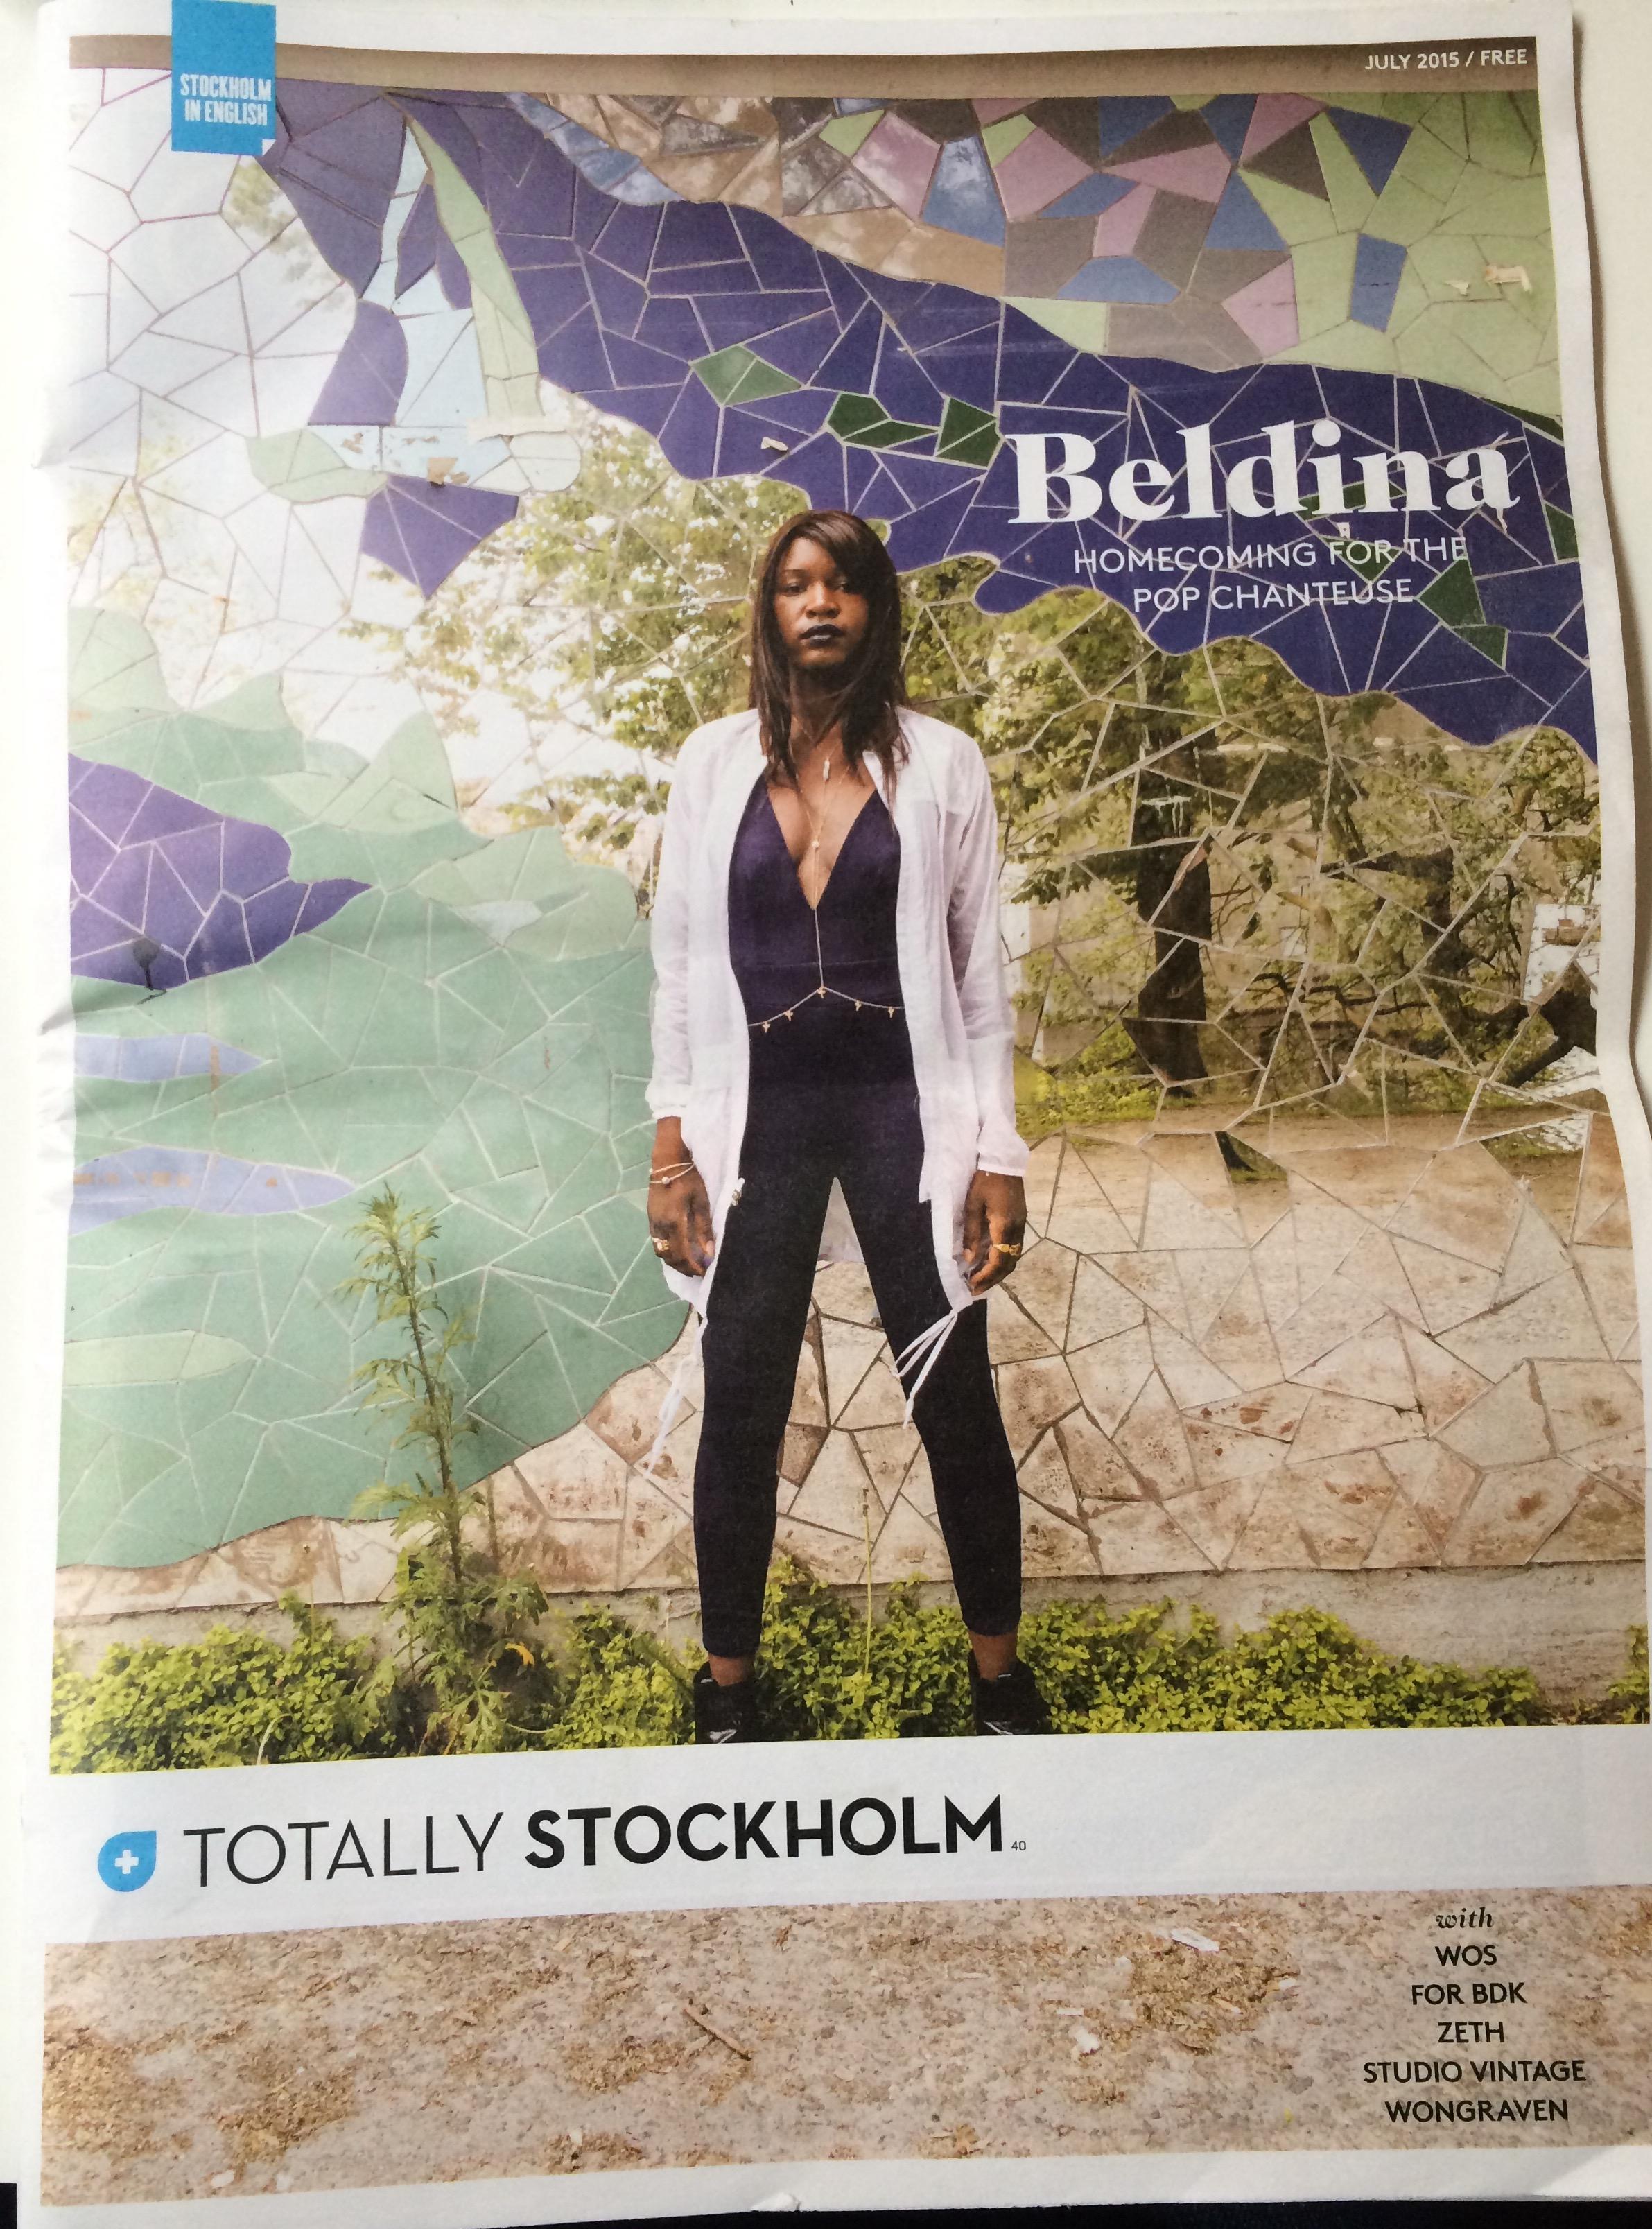 Totally Stockholm omslag - Beldina.jpg